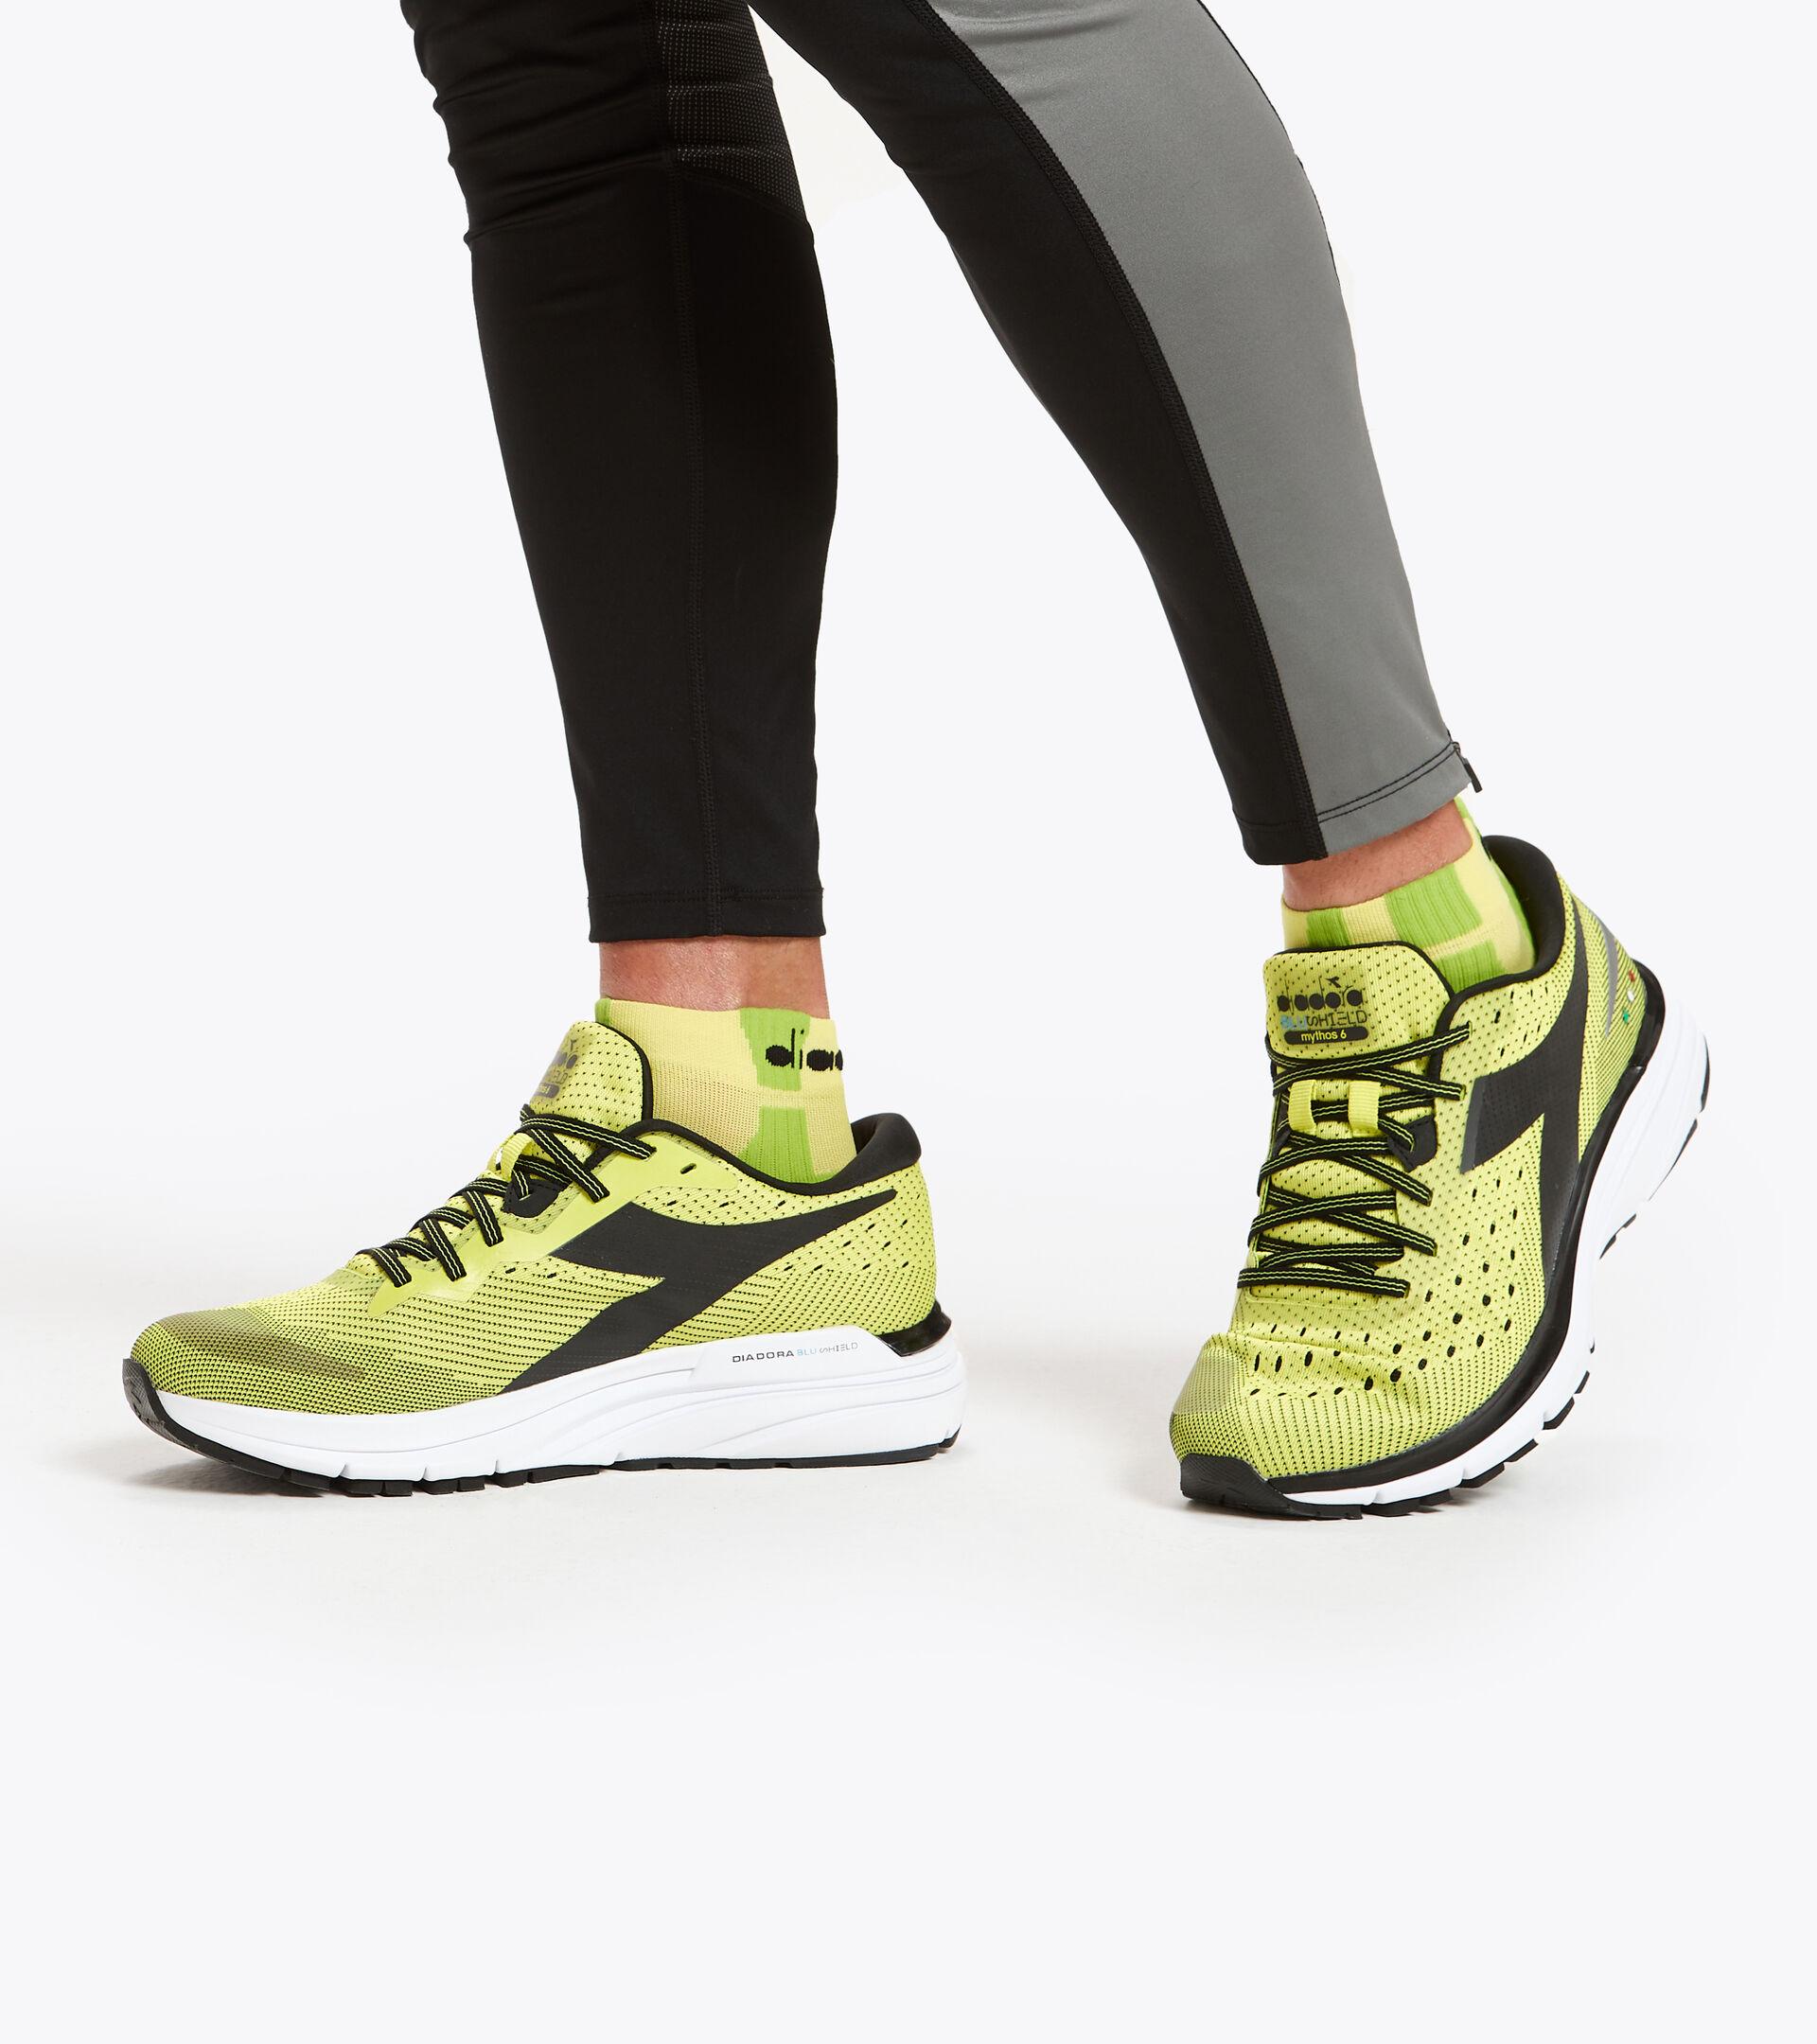 Footwear Sport UOMO MYTHOS BLUSHIELD 6 VERDE SORGENTE/NERO/BIANCO Diadora